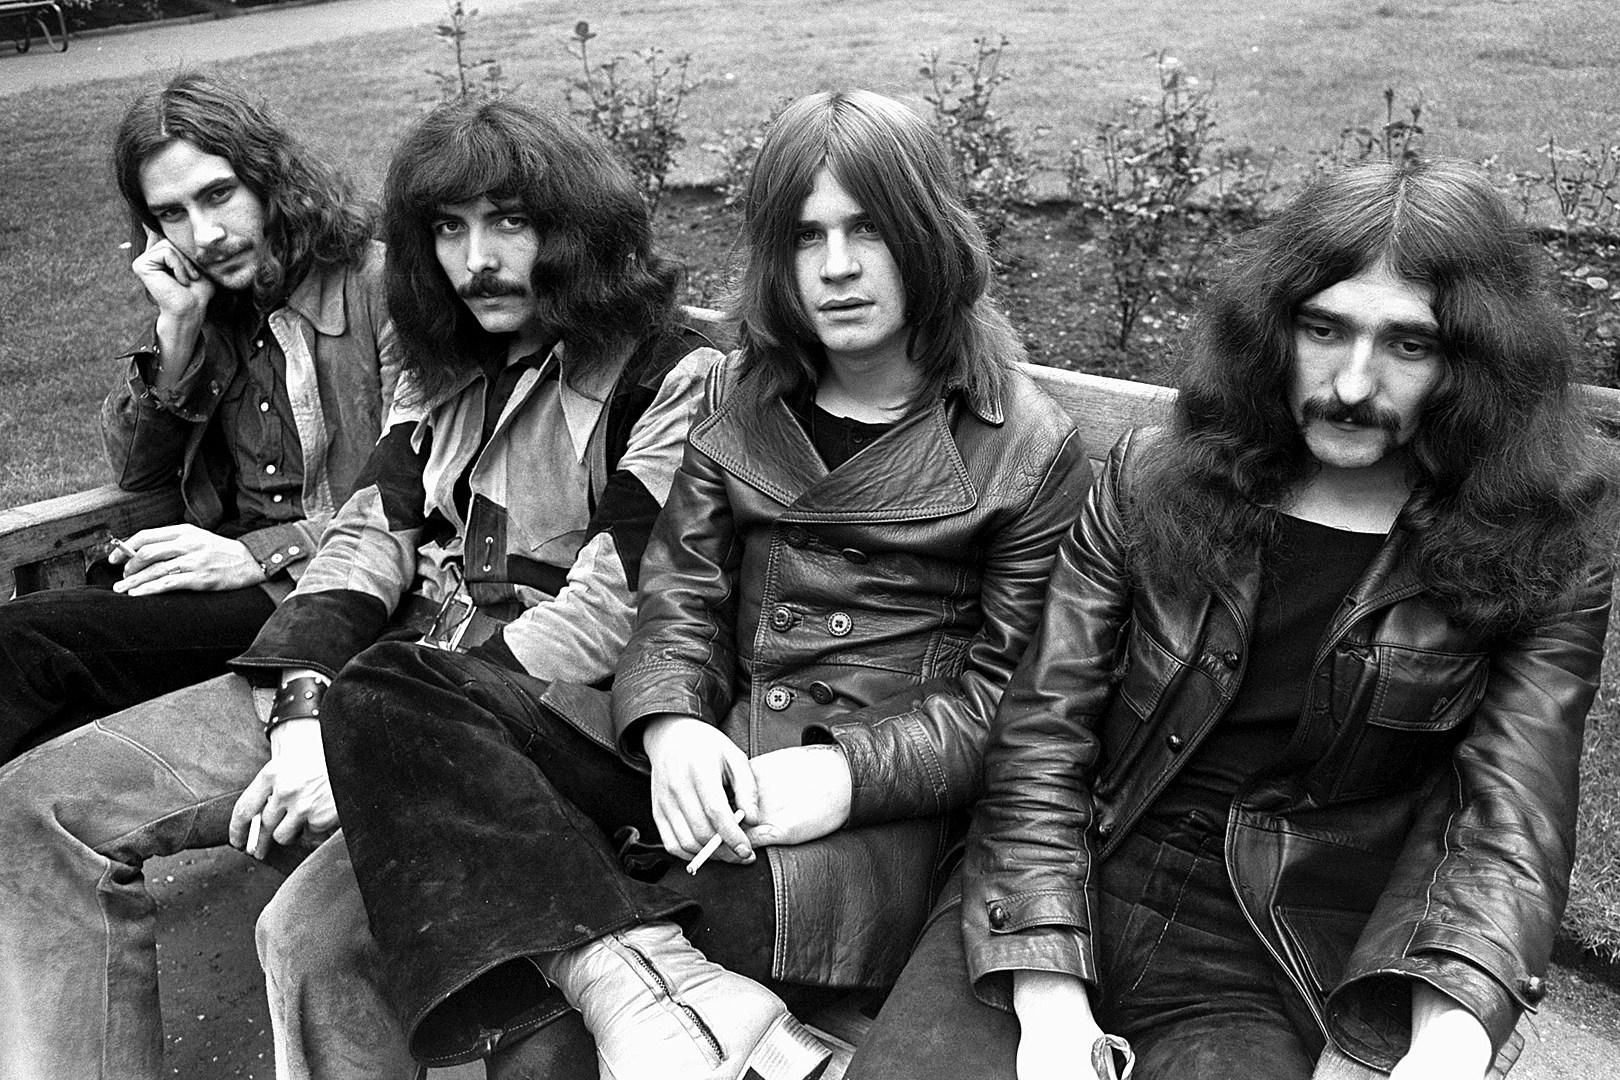 'Black Sabbath Bridge' Architect Seeks to Reunite Original Four Members